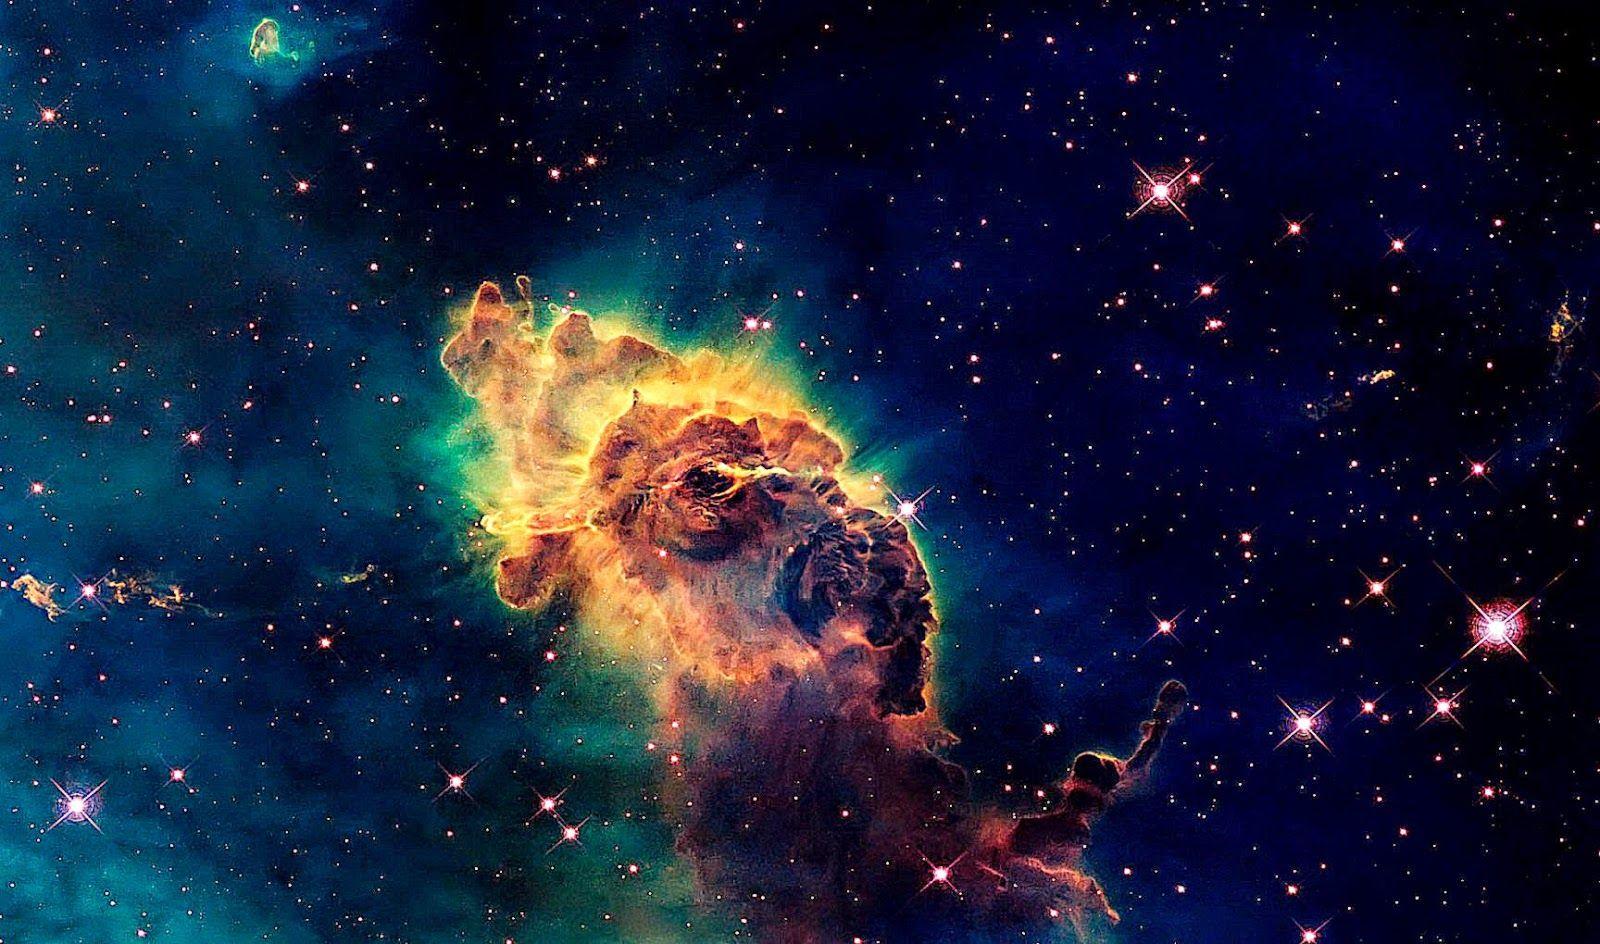 Stars Galaxies HD Desktop Wallpaper Widescreen Fullscreen 1024x768 Galaxy Hd